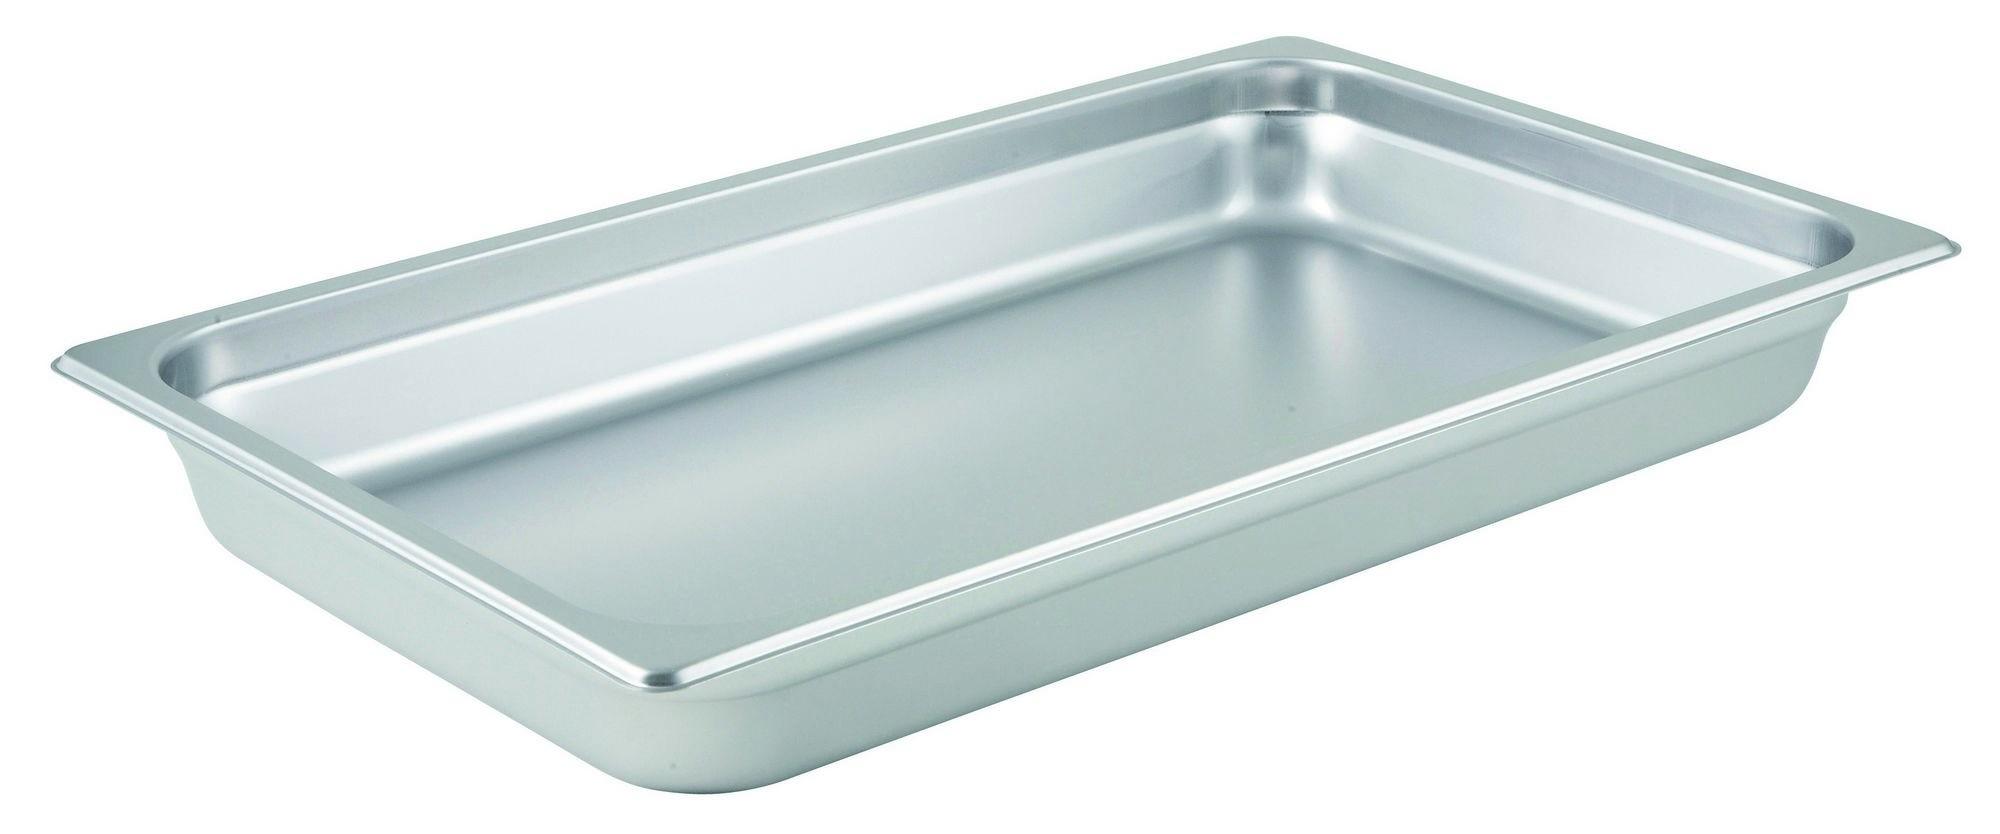 "Winco Spjl-102 Full Size Anti-Jam 25 Gauge Steam Table Pan 2-1/2"" Deep"